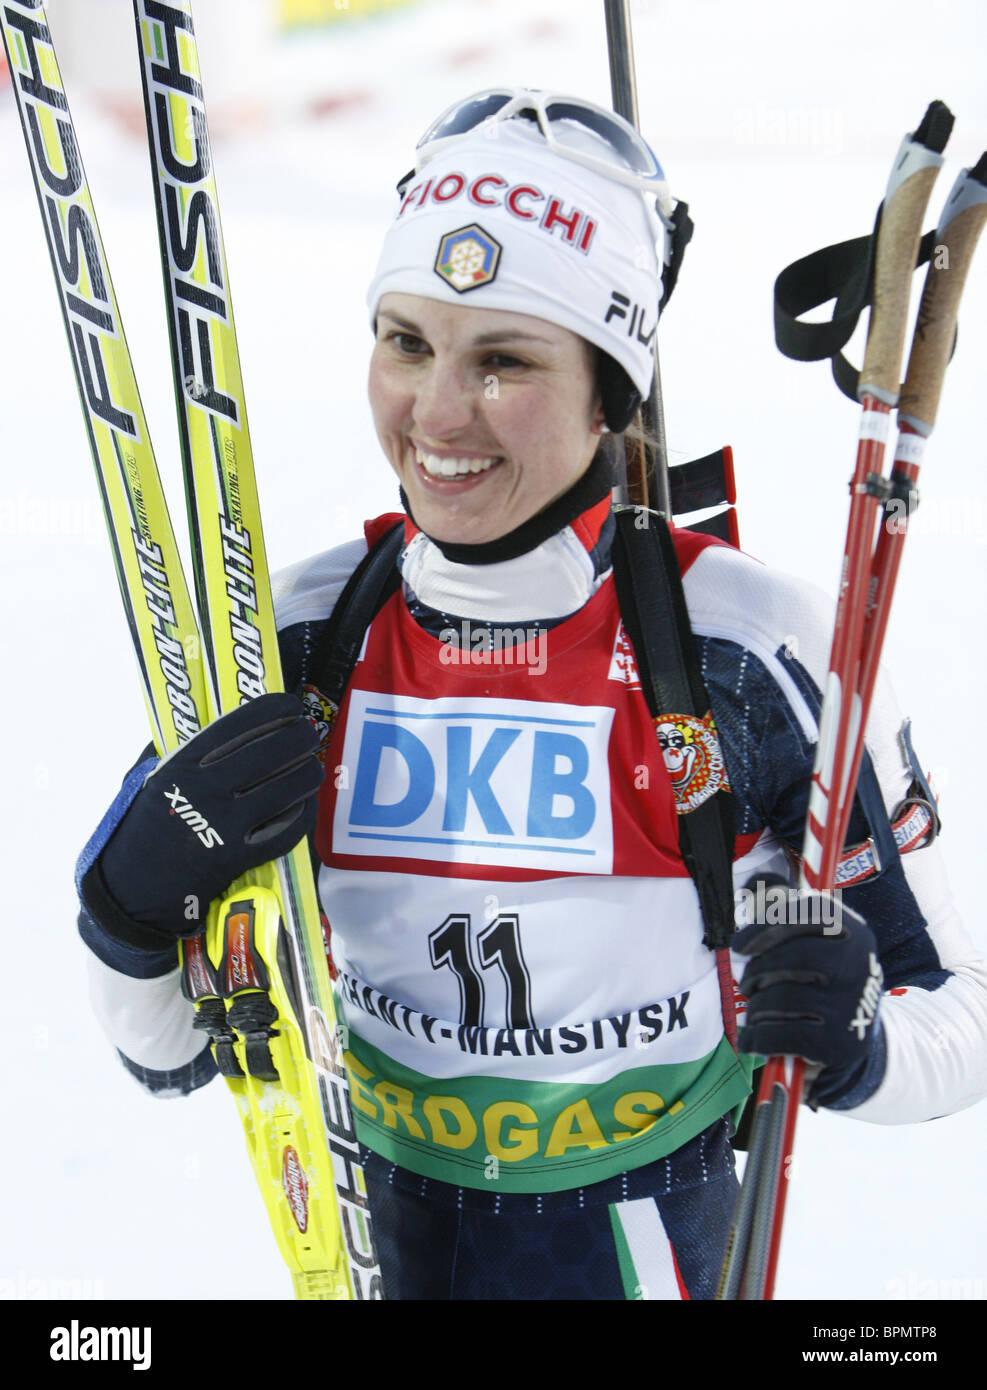 Biathlon World Cup Final - Stock Image